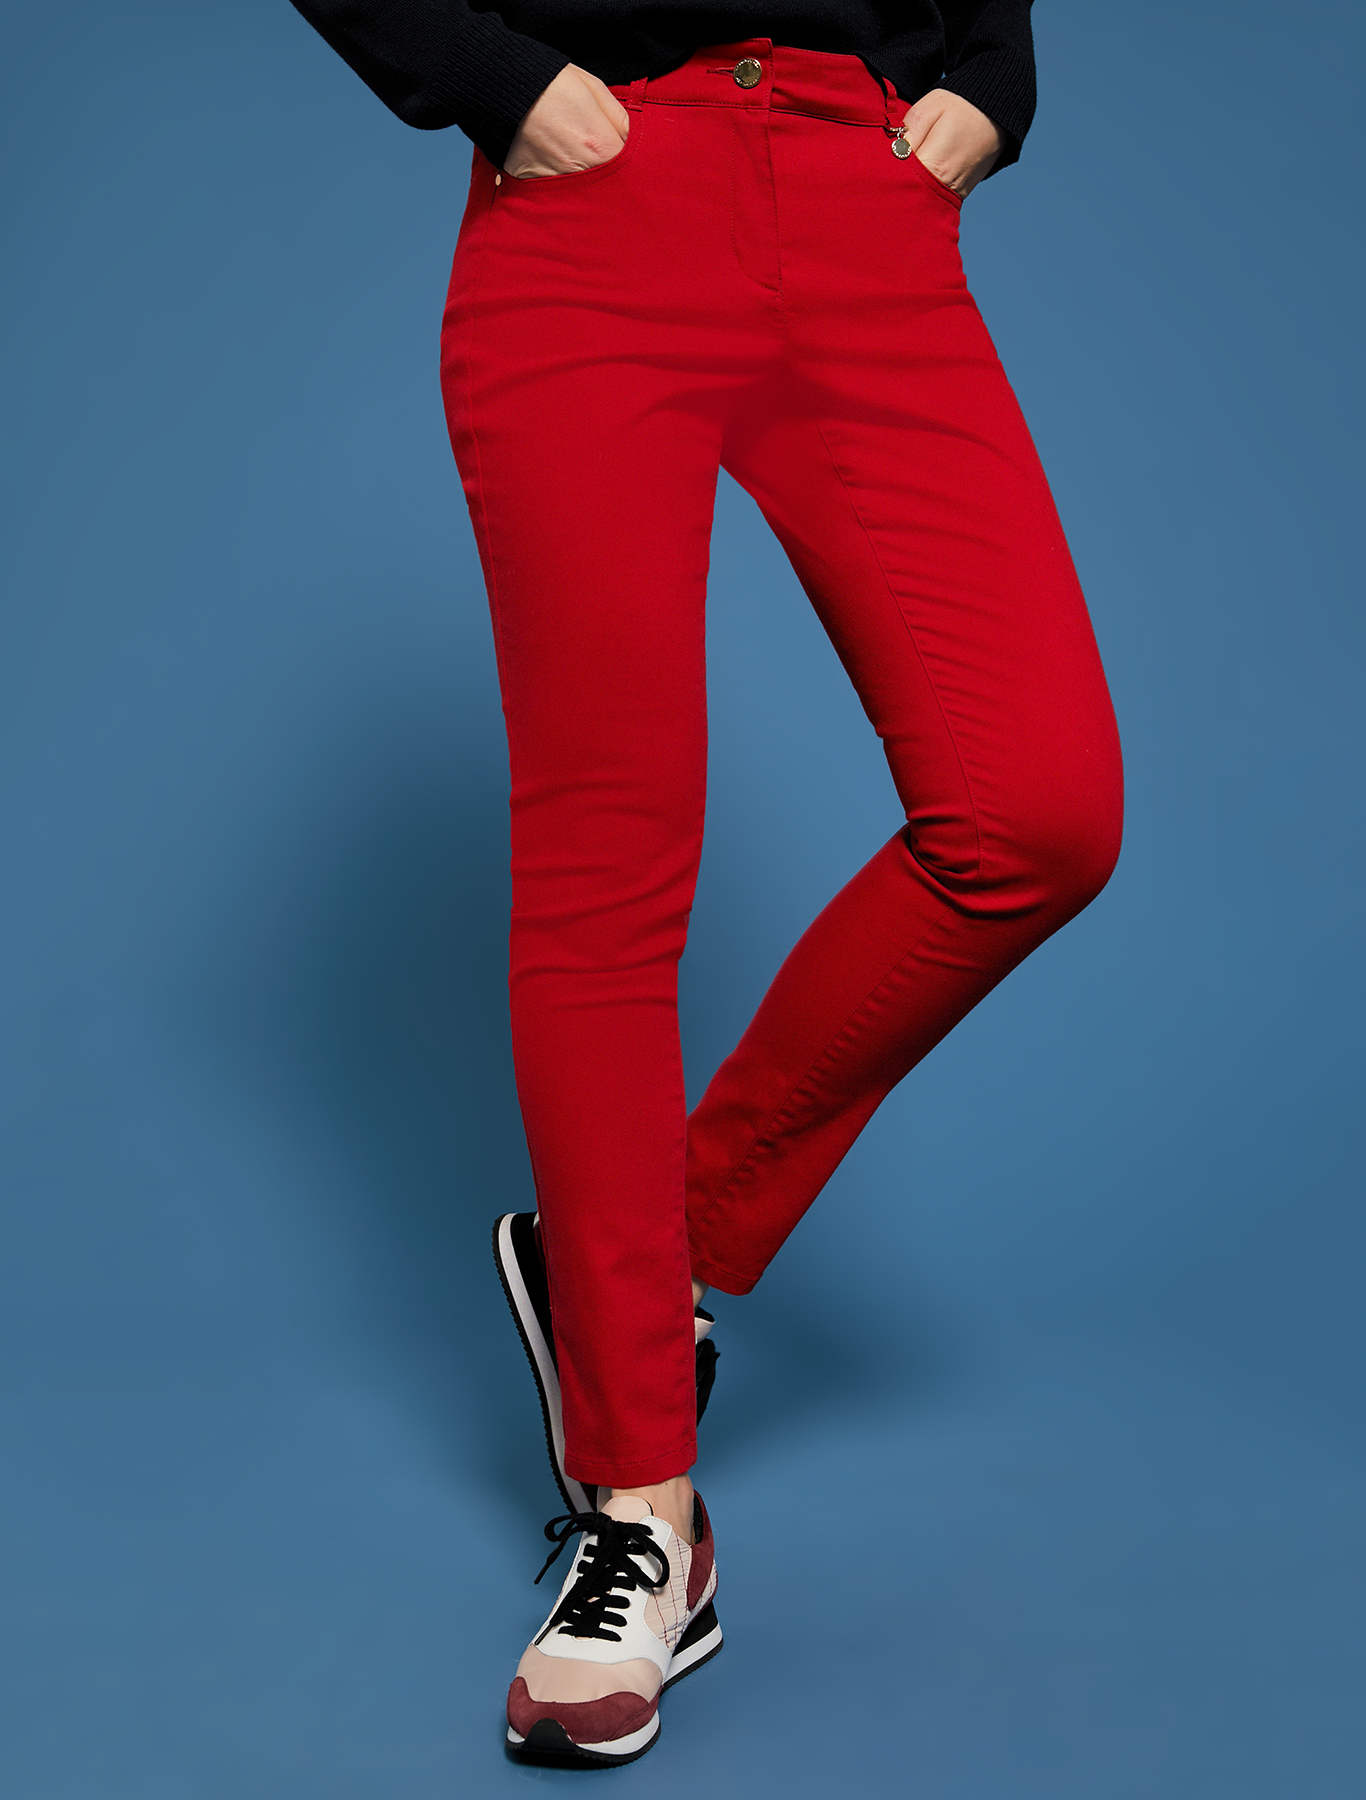 Skinny gabardine trousers - red - pennyblack